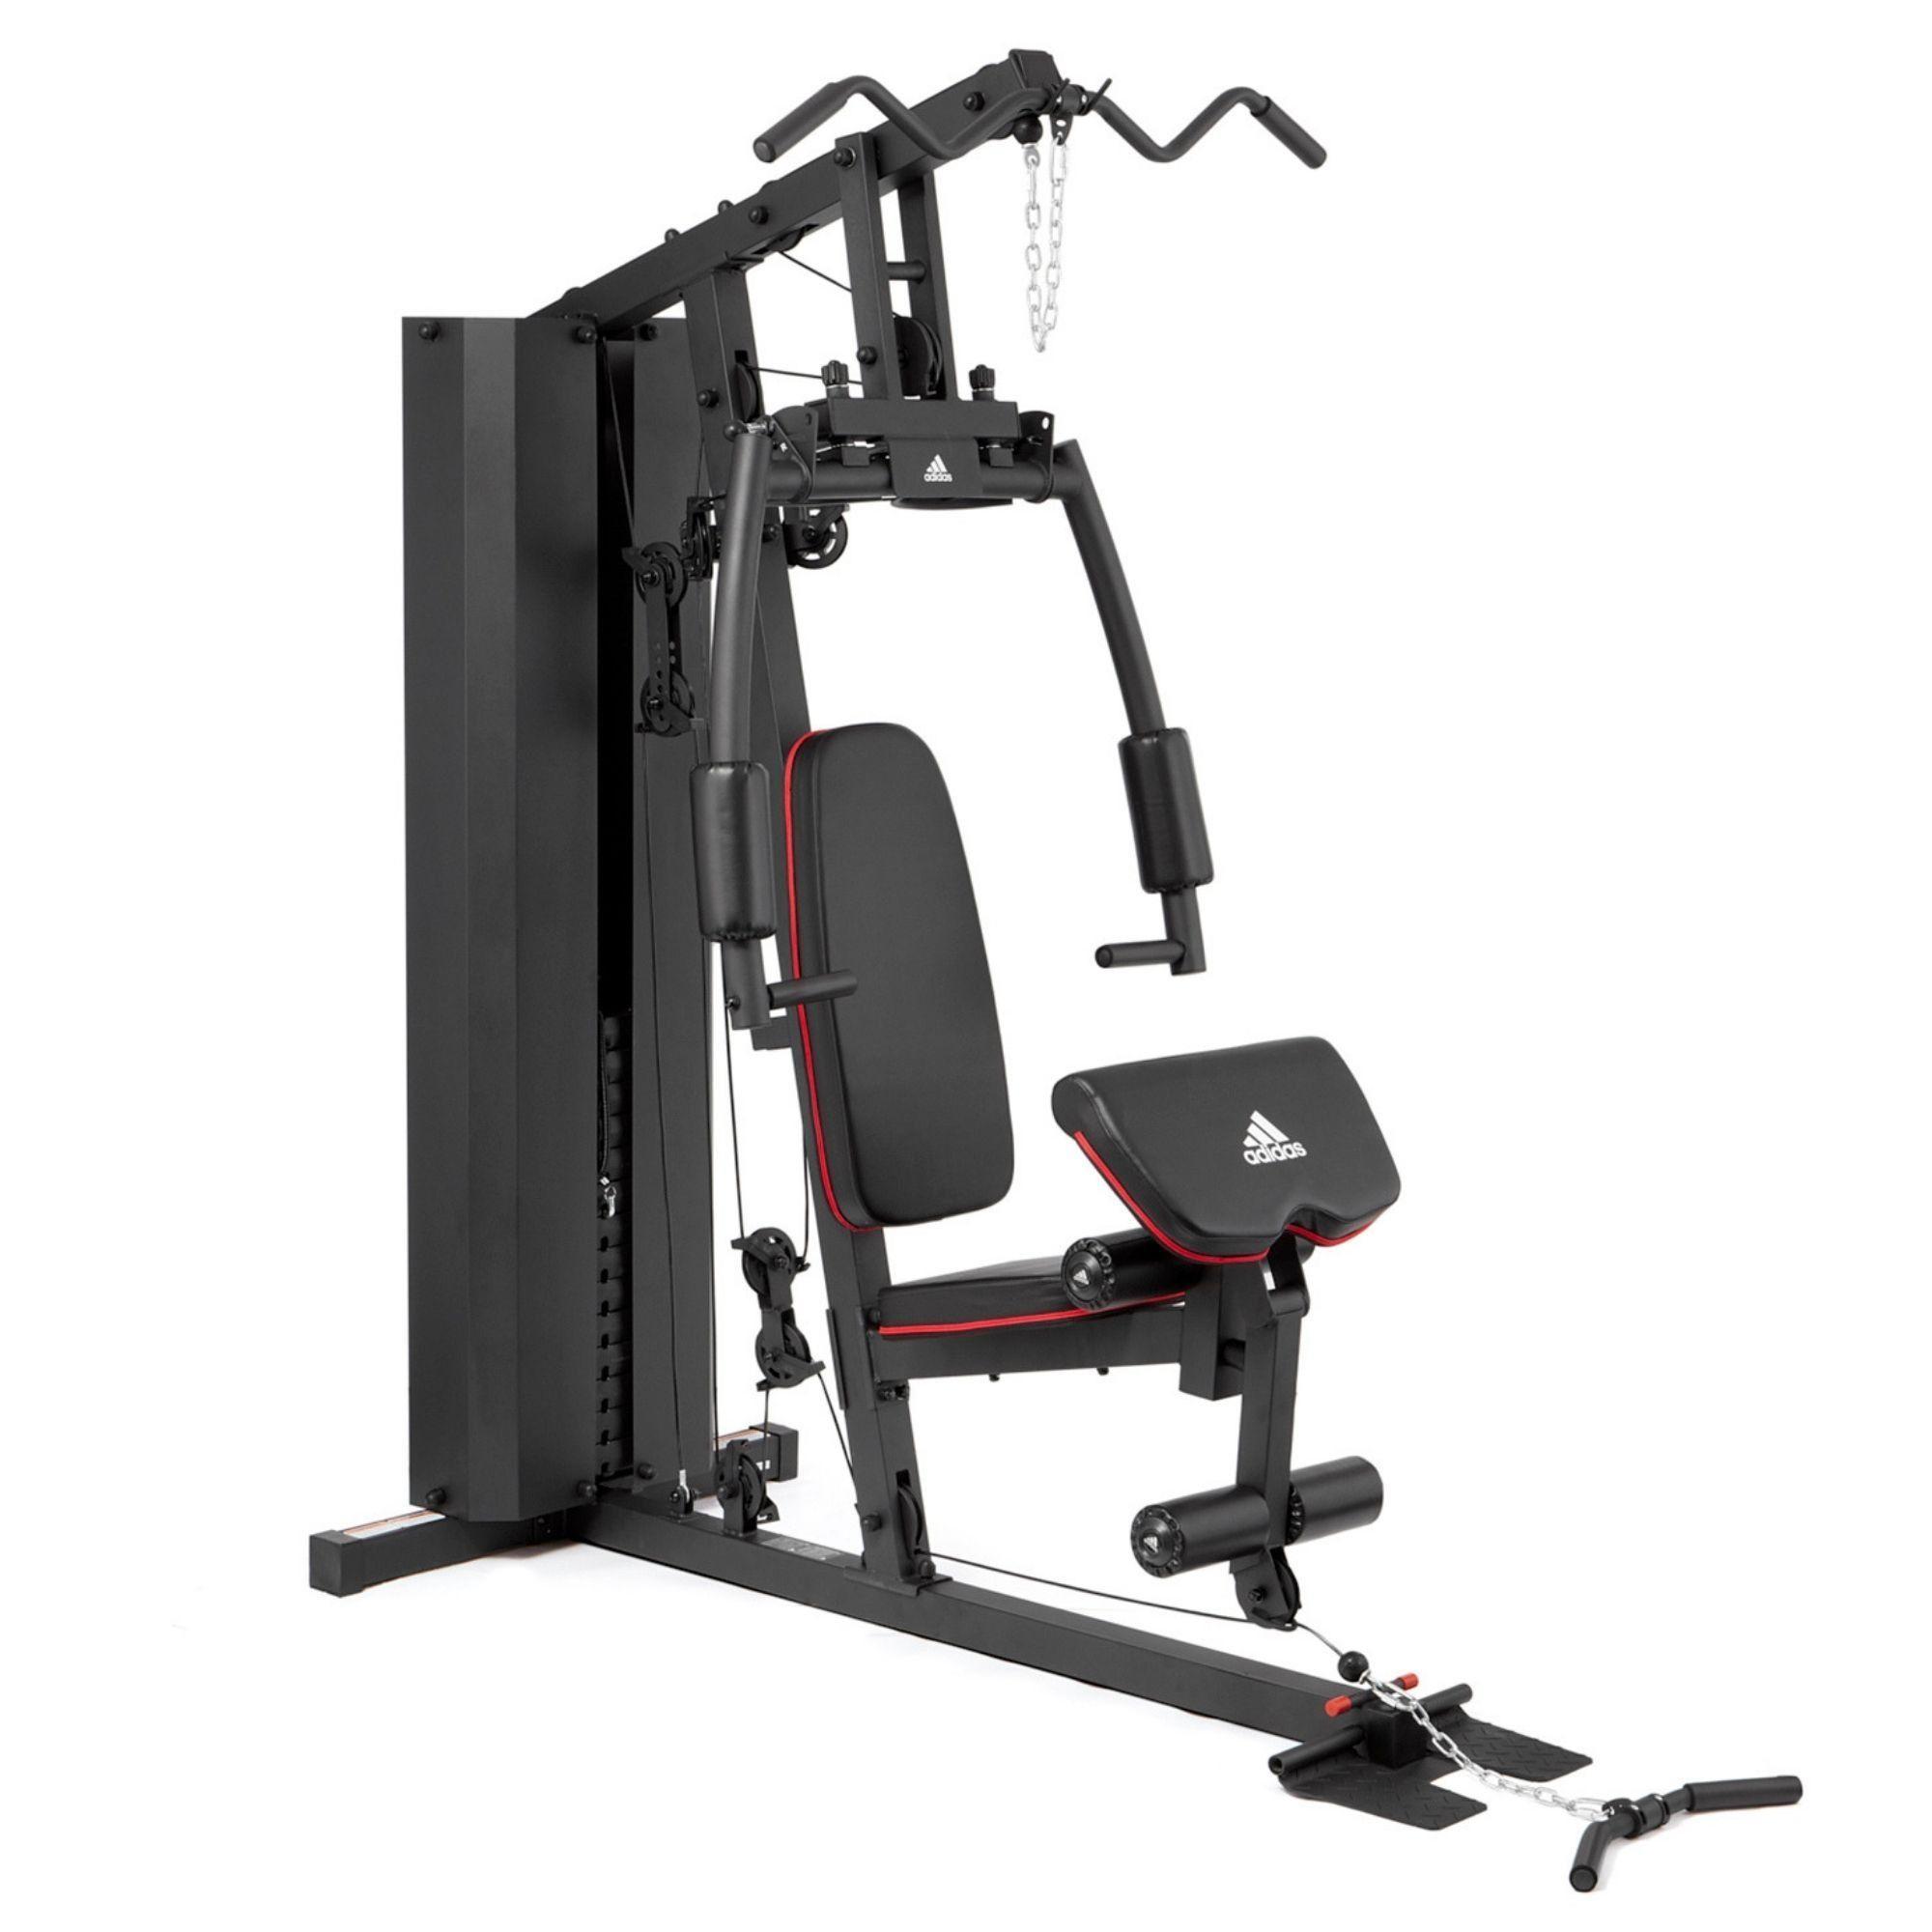 Station De Musculation Home Gym Adidas Decathlon